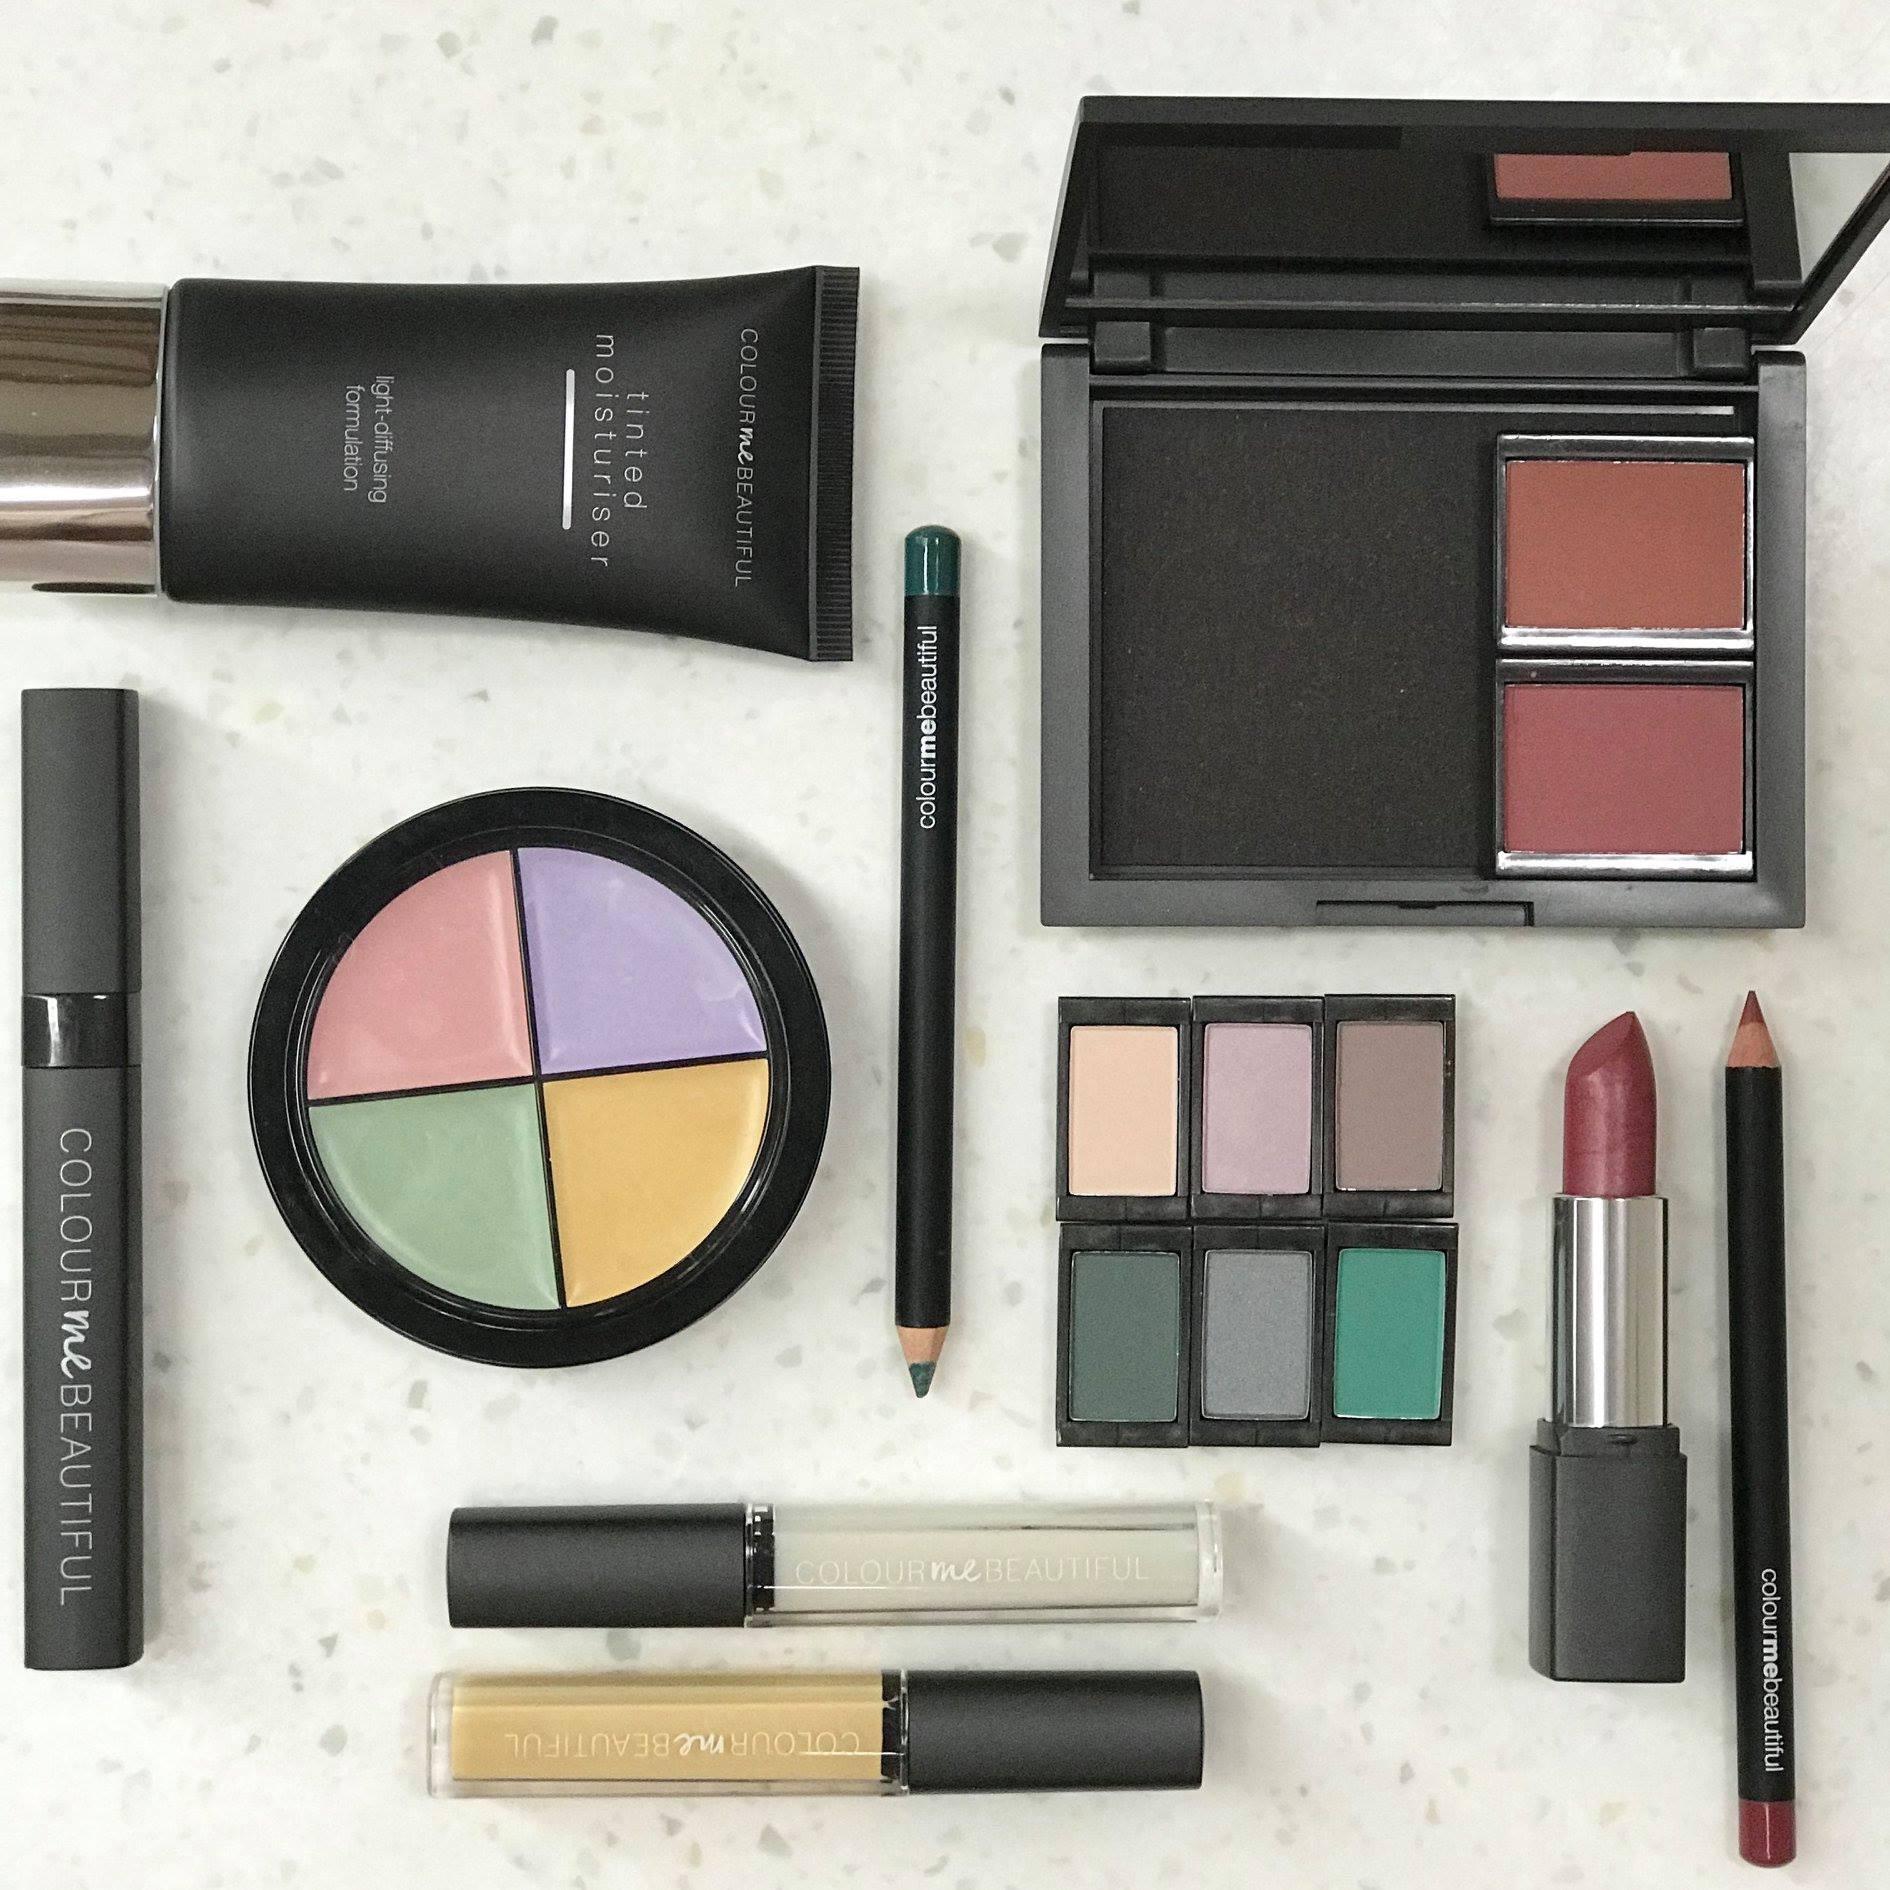 Colour me beautiful cosmetic range